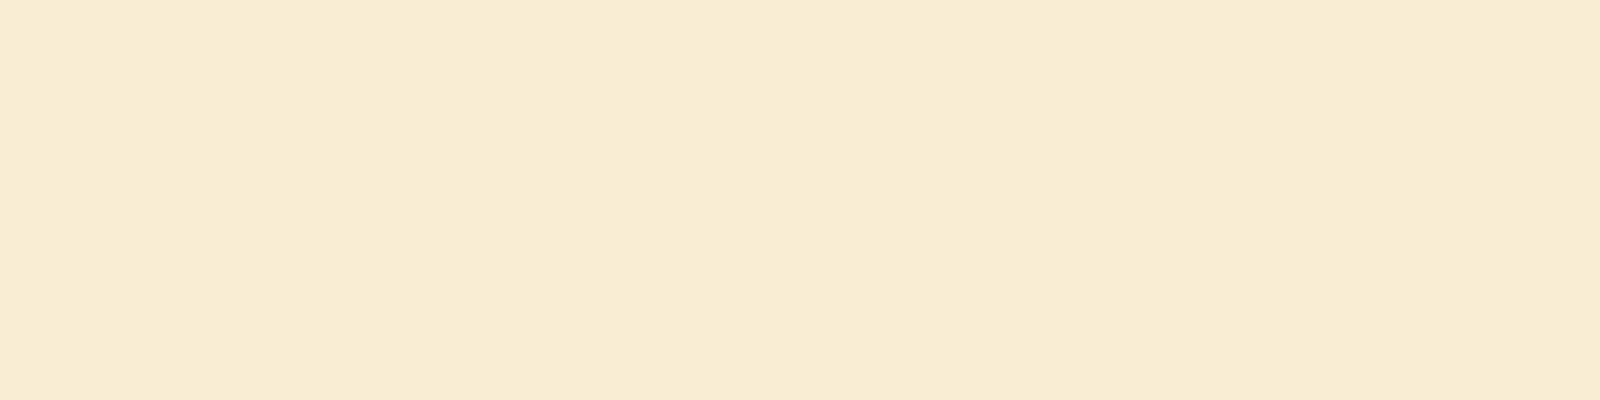 817 Cream Gutter Color